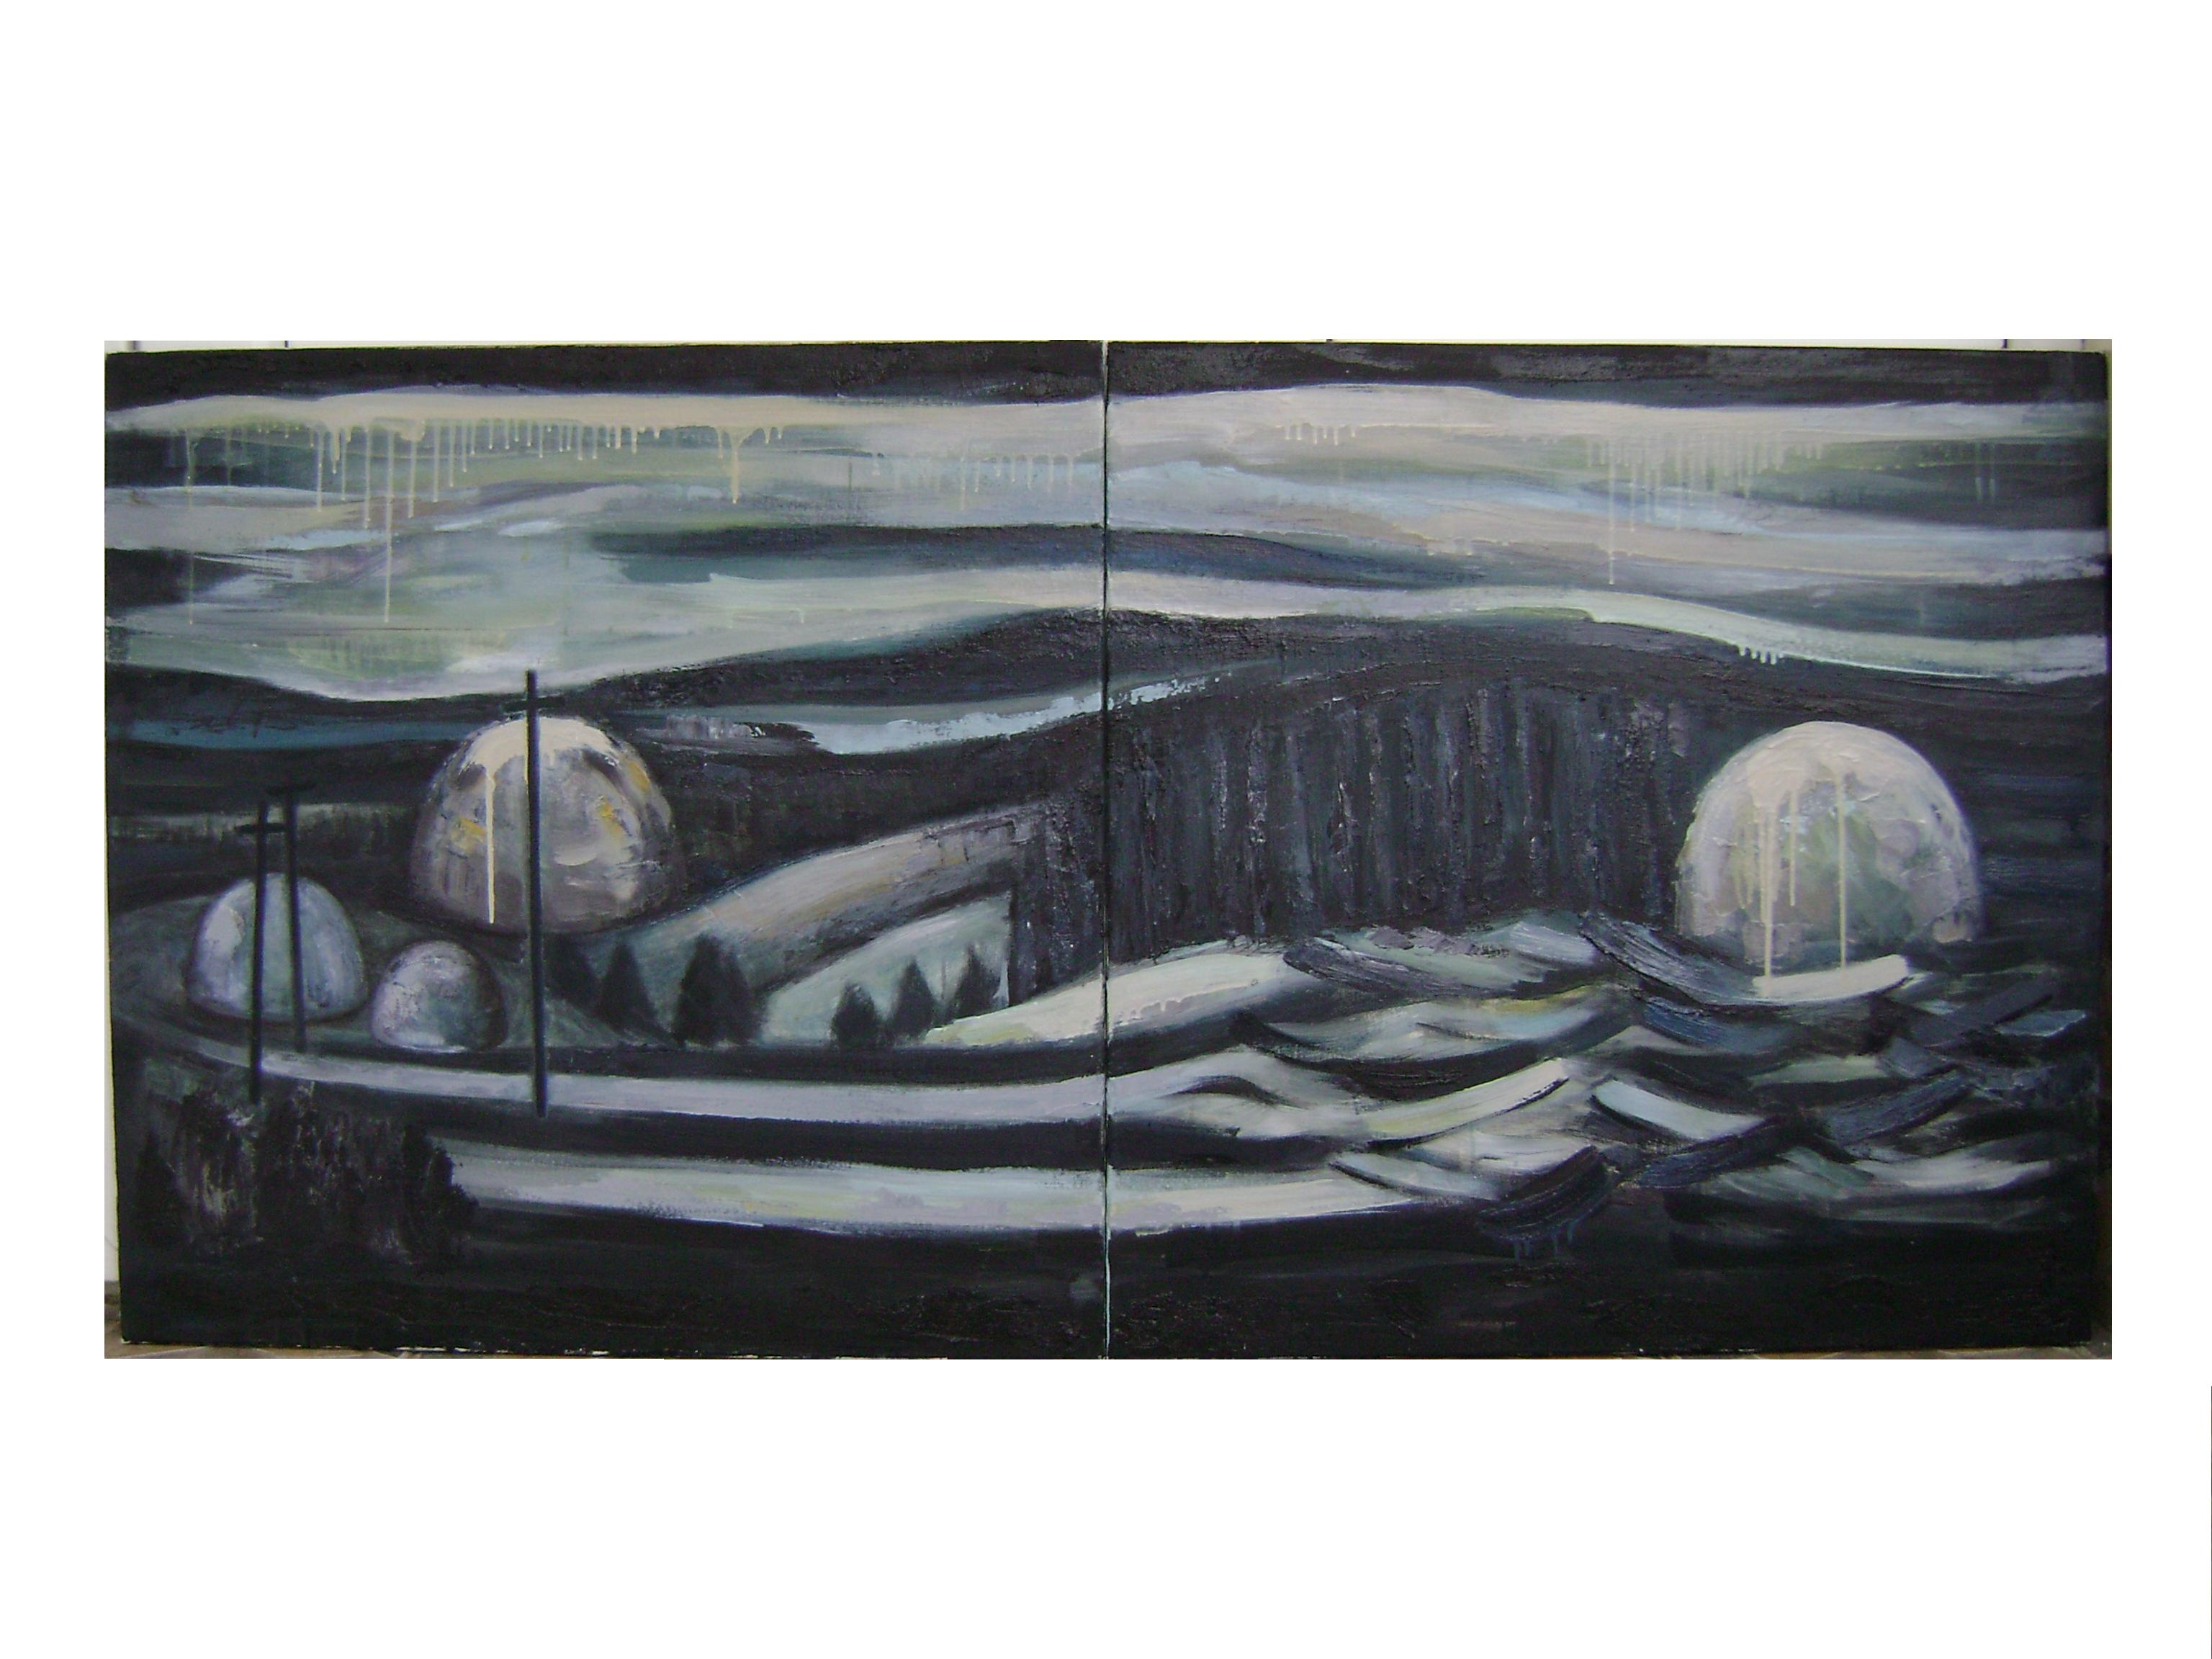 Andreea Rus, In Light (73), tehnica mixta pe panza, diptic, 80-160 cm., 2015